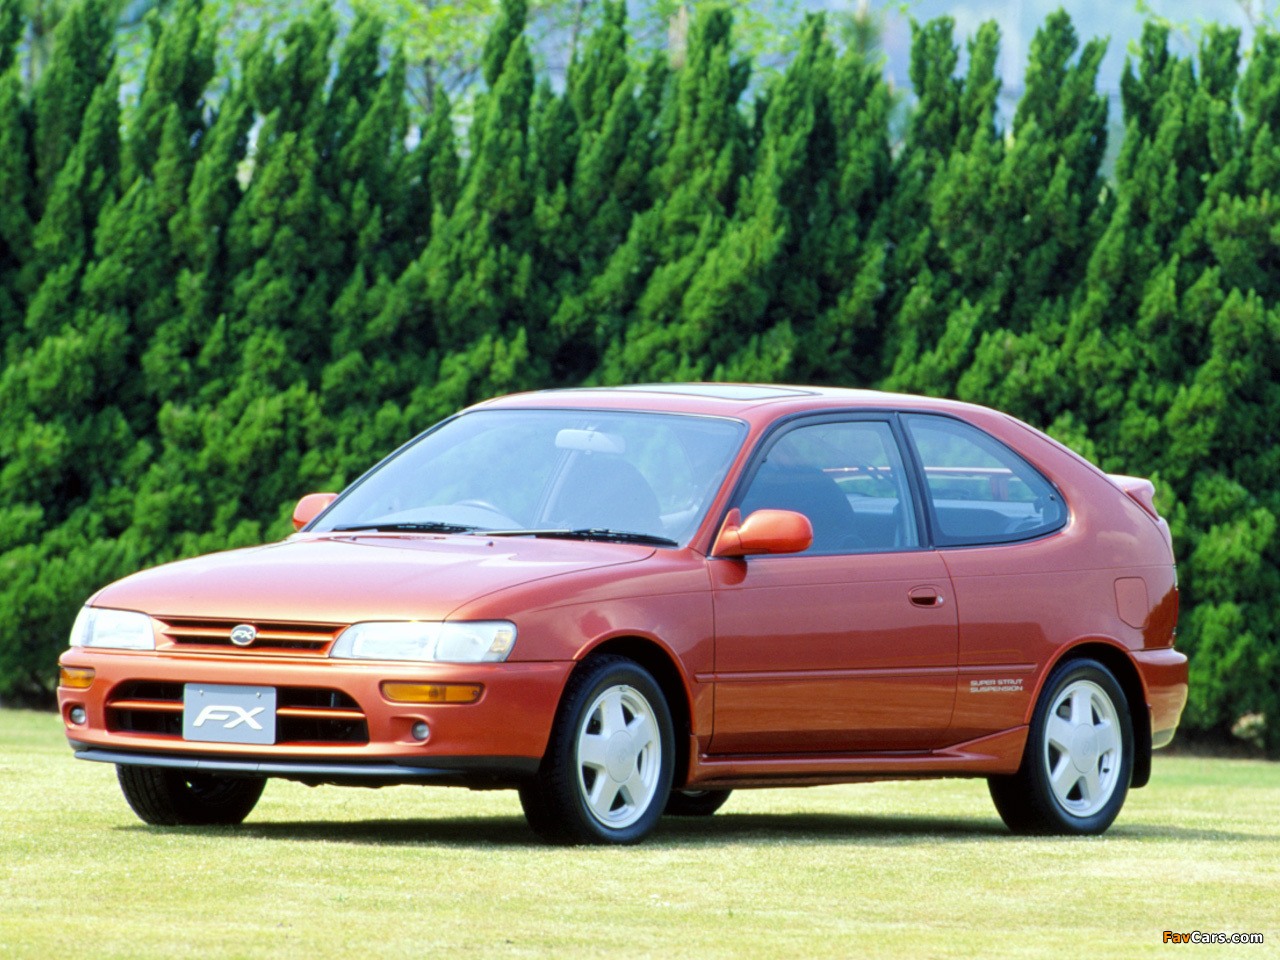 Toyota Corolla Fx Jp Spec E100 1992 95 Wallpapers 1280x960